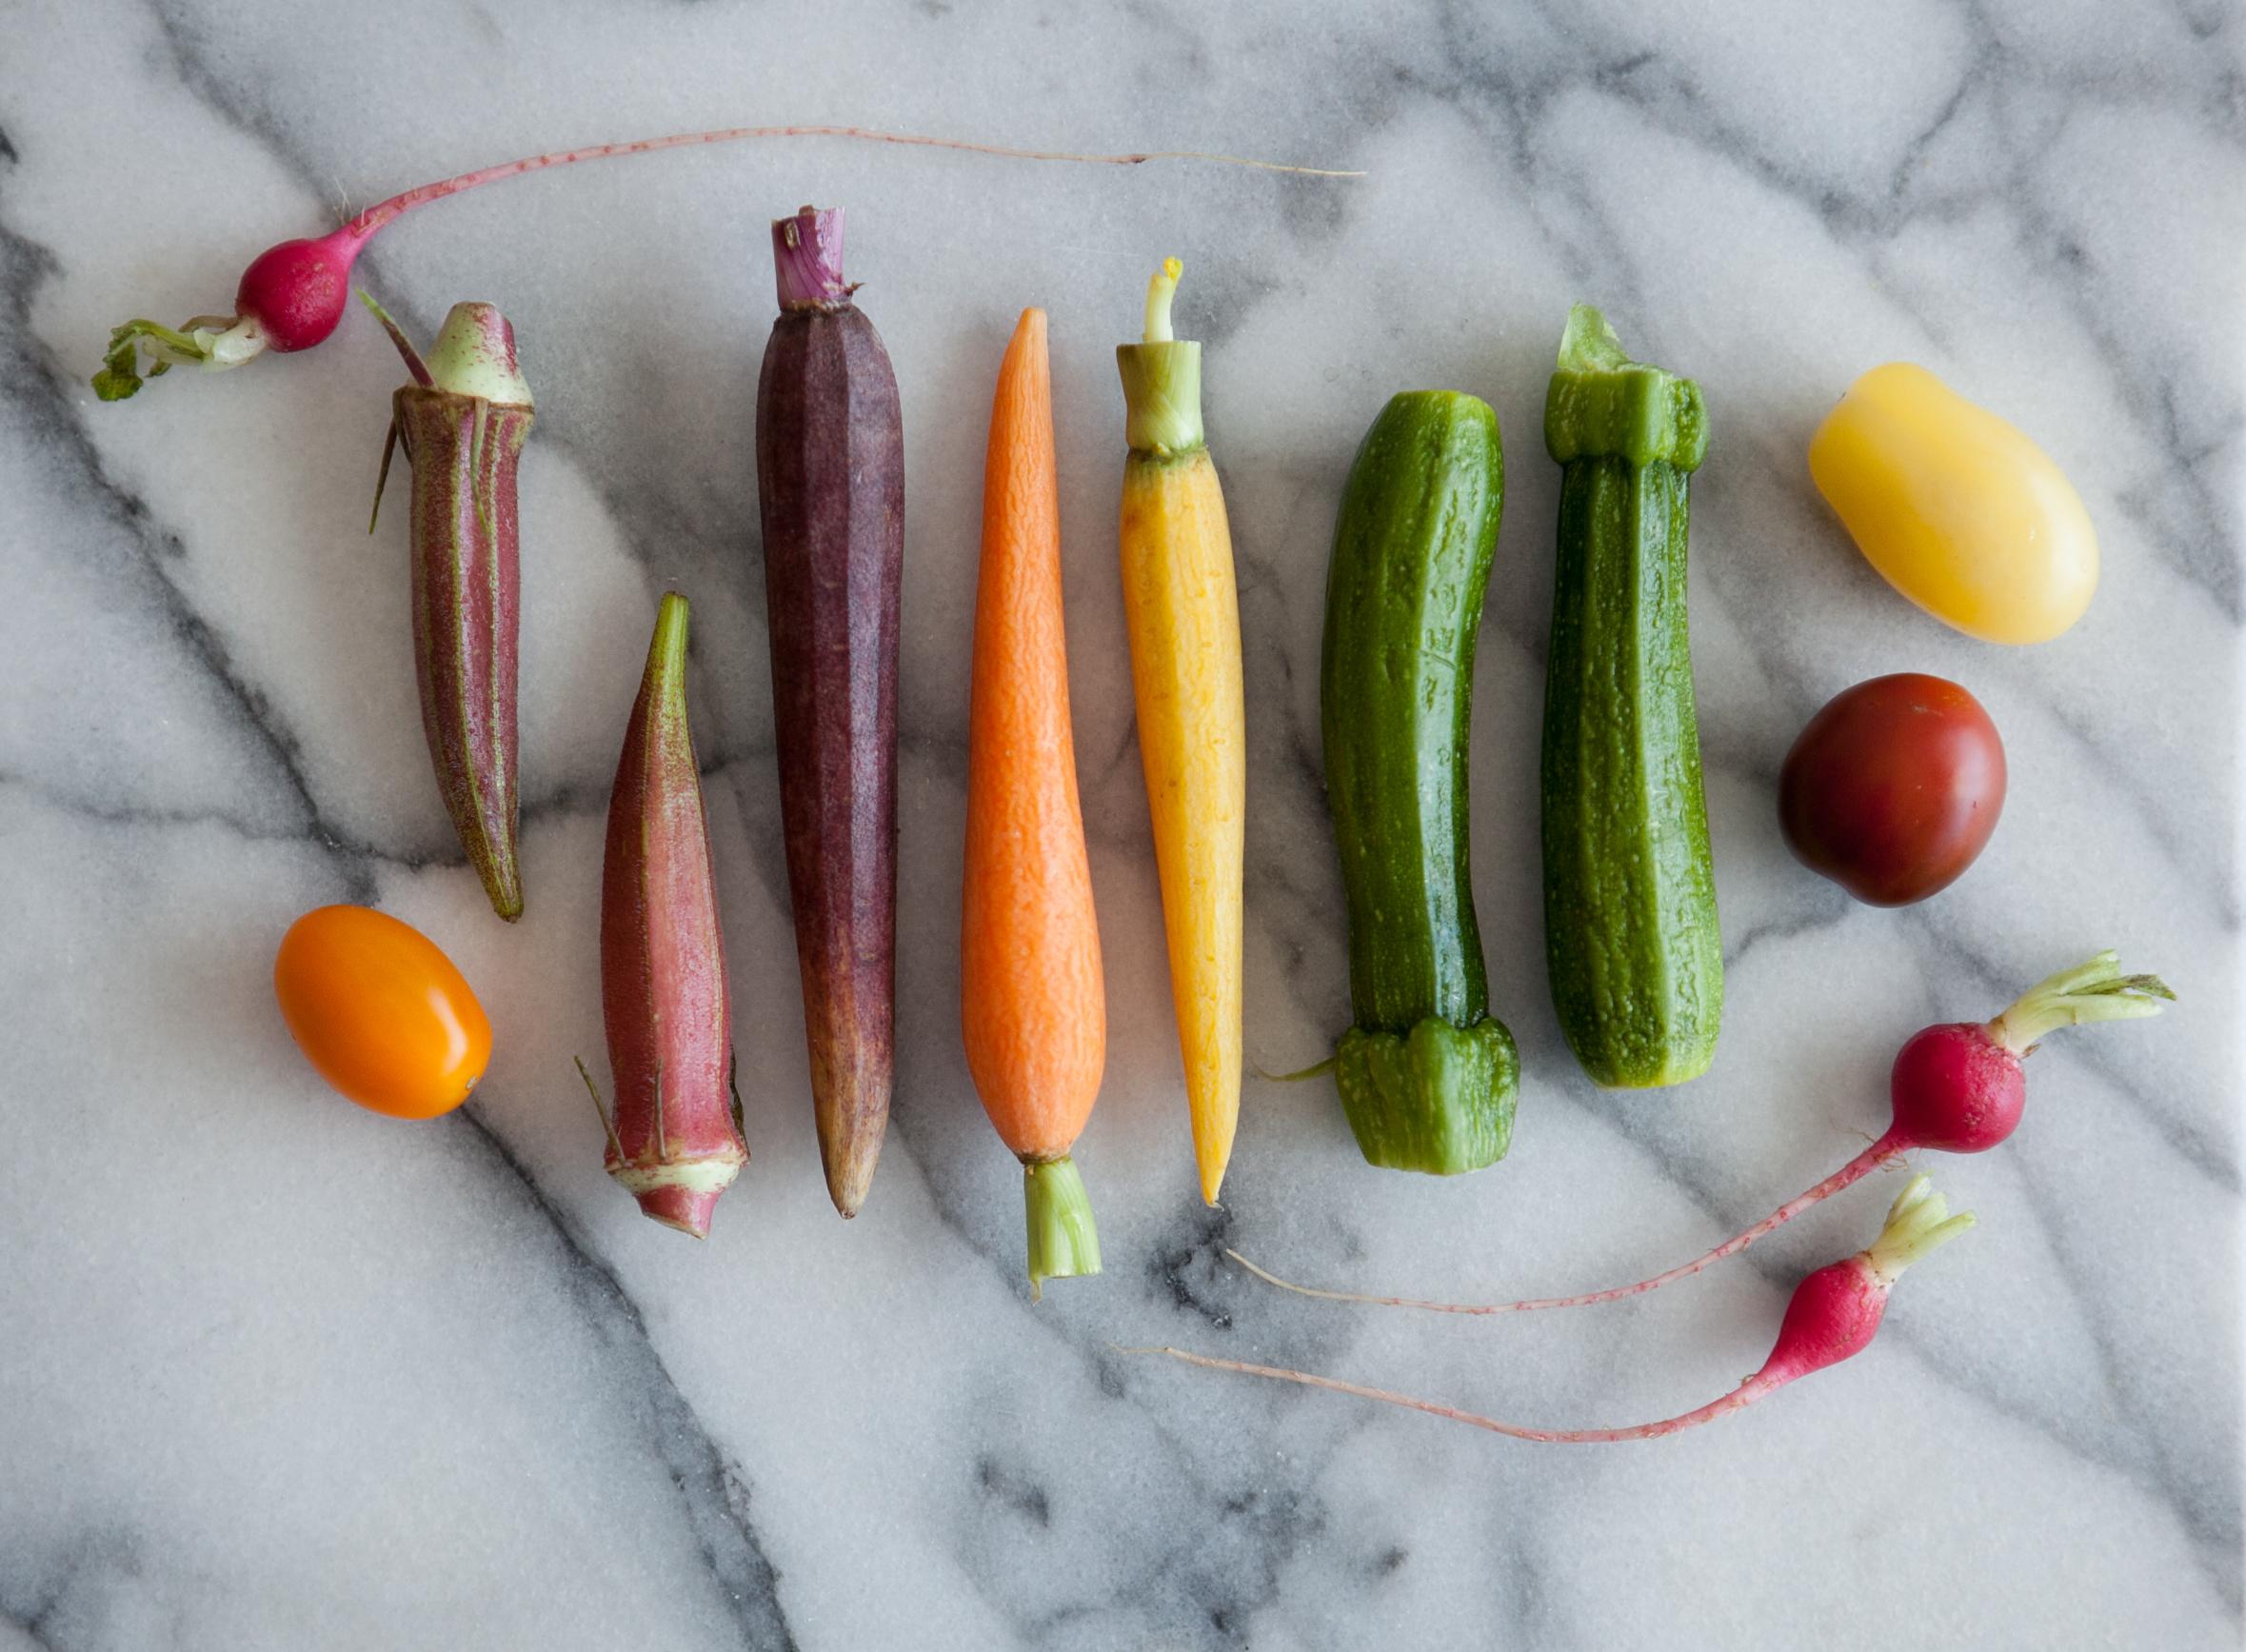 tampa-food-photographer-ablankplate-83.jpg